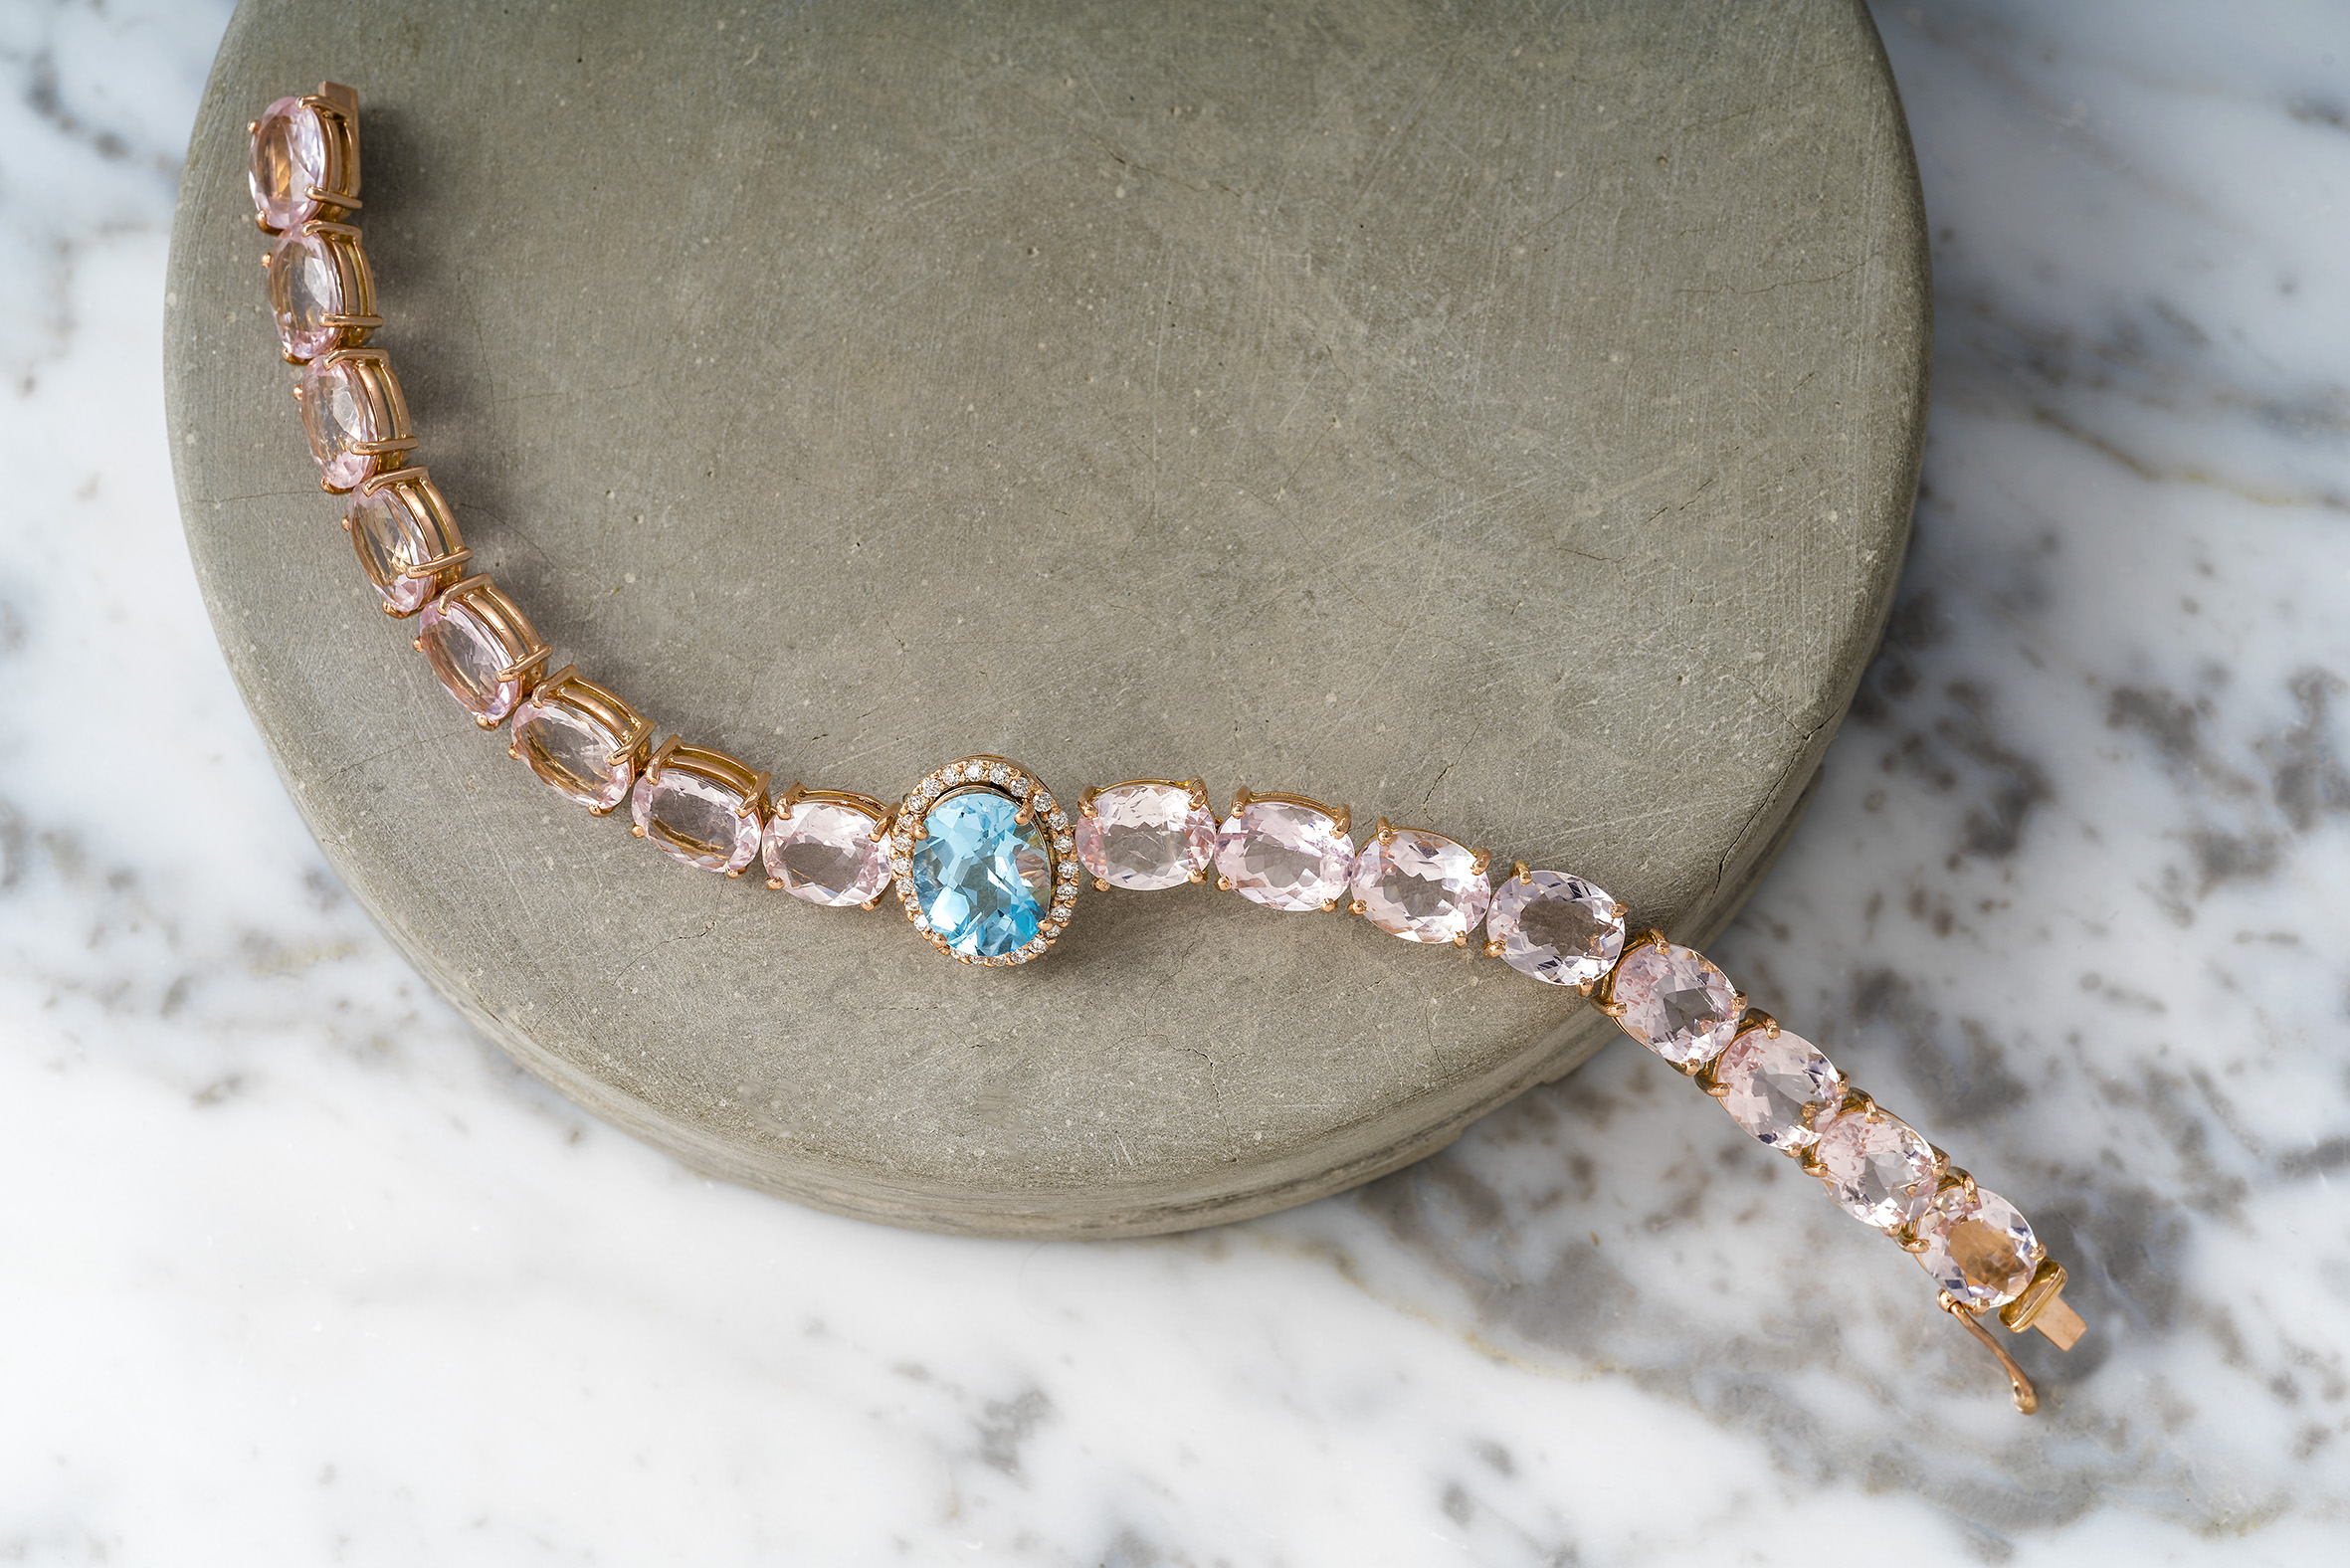 Pulseiras - Bracelets